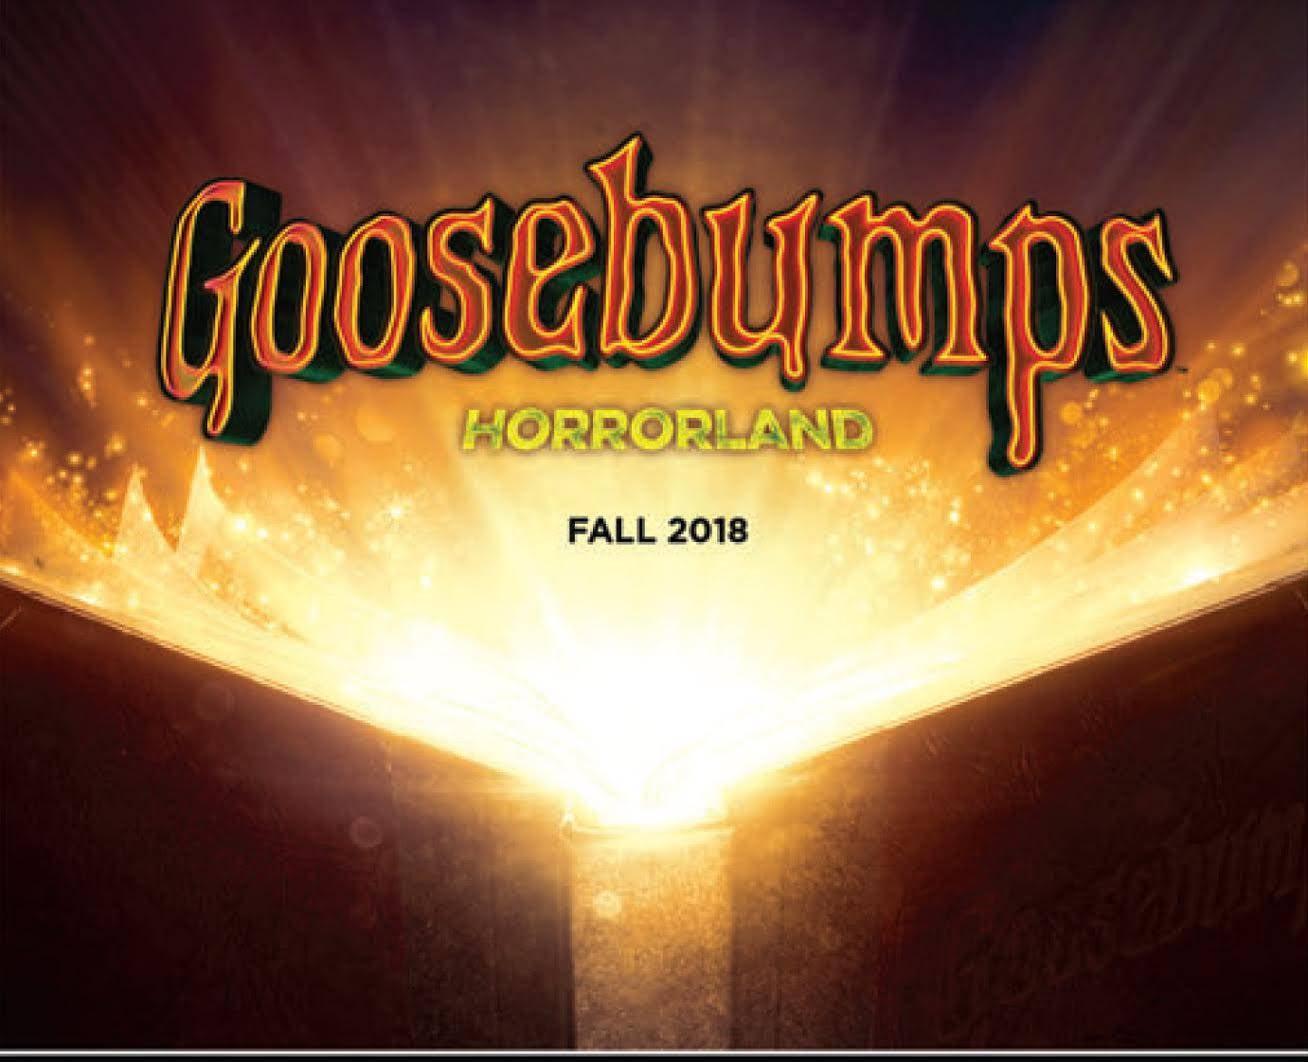 Goosebumps 2 Title And Promo Image Revealed